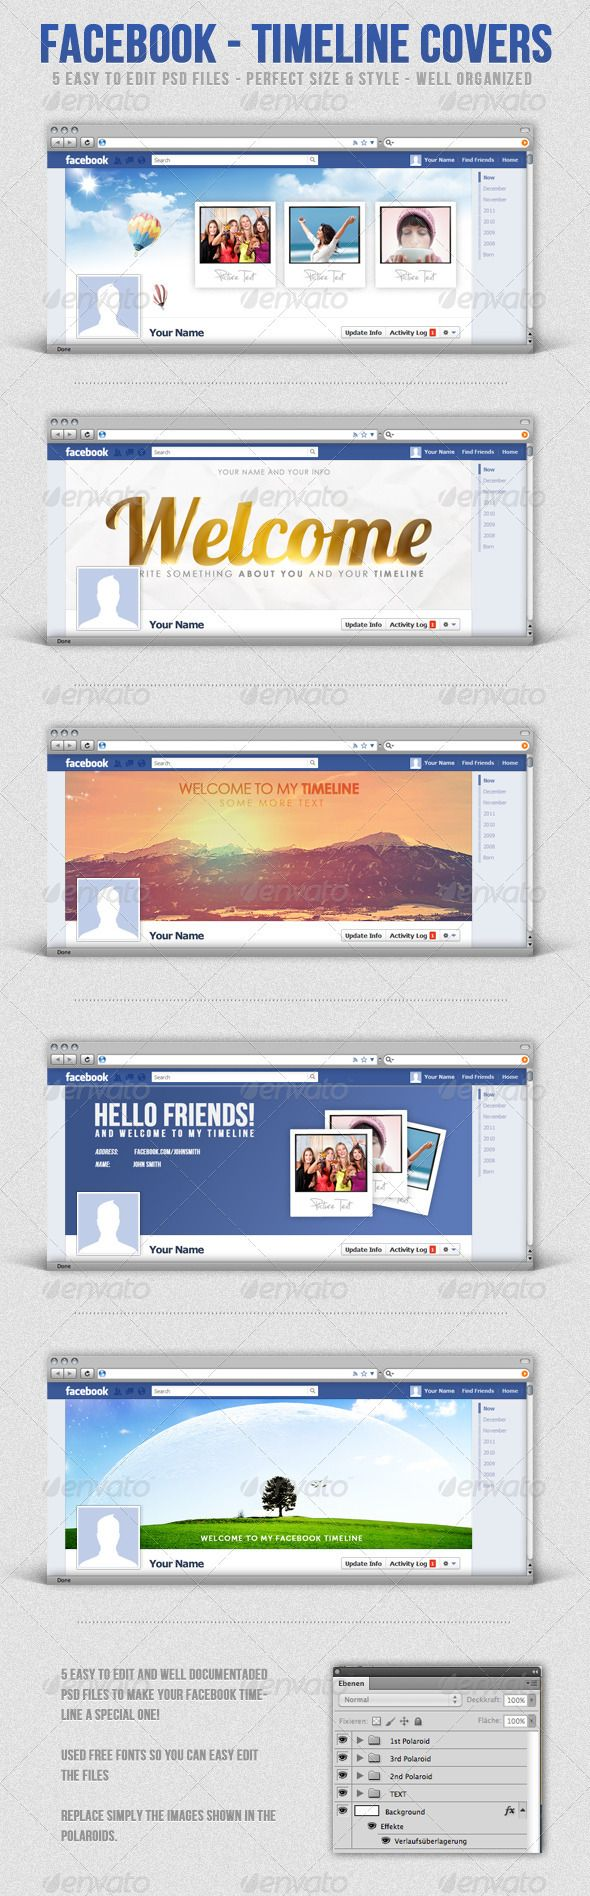 Facebook Timeline Covers Facebook Timeline Timeline Covers And